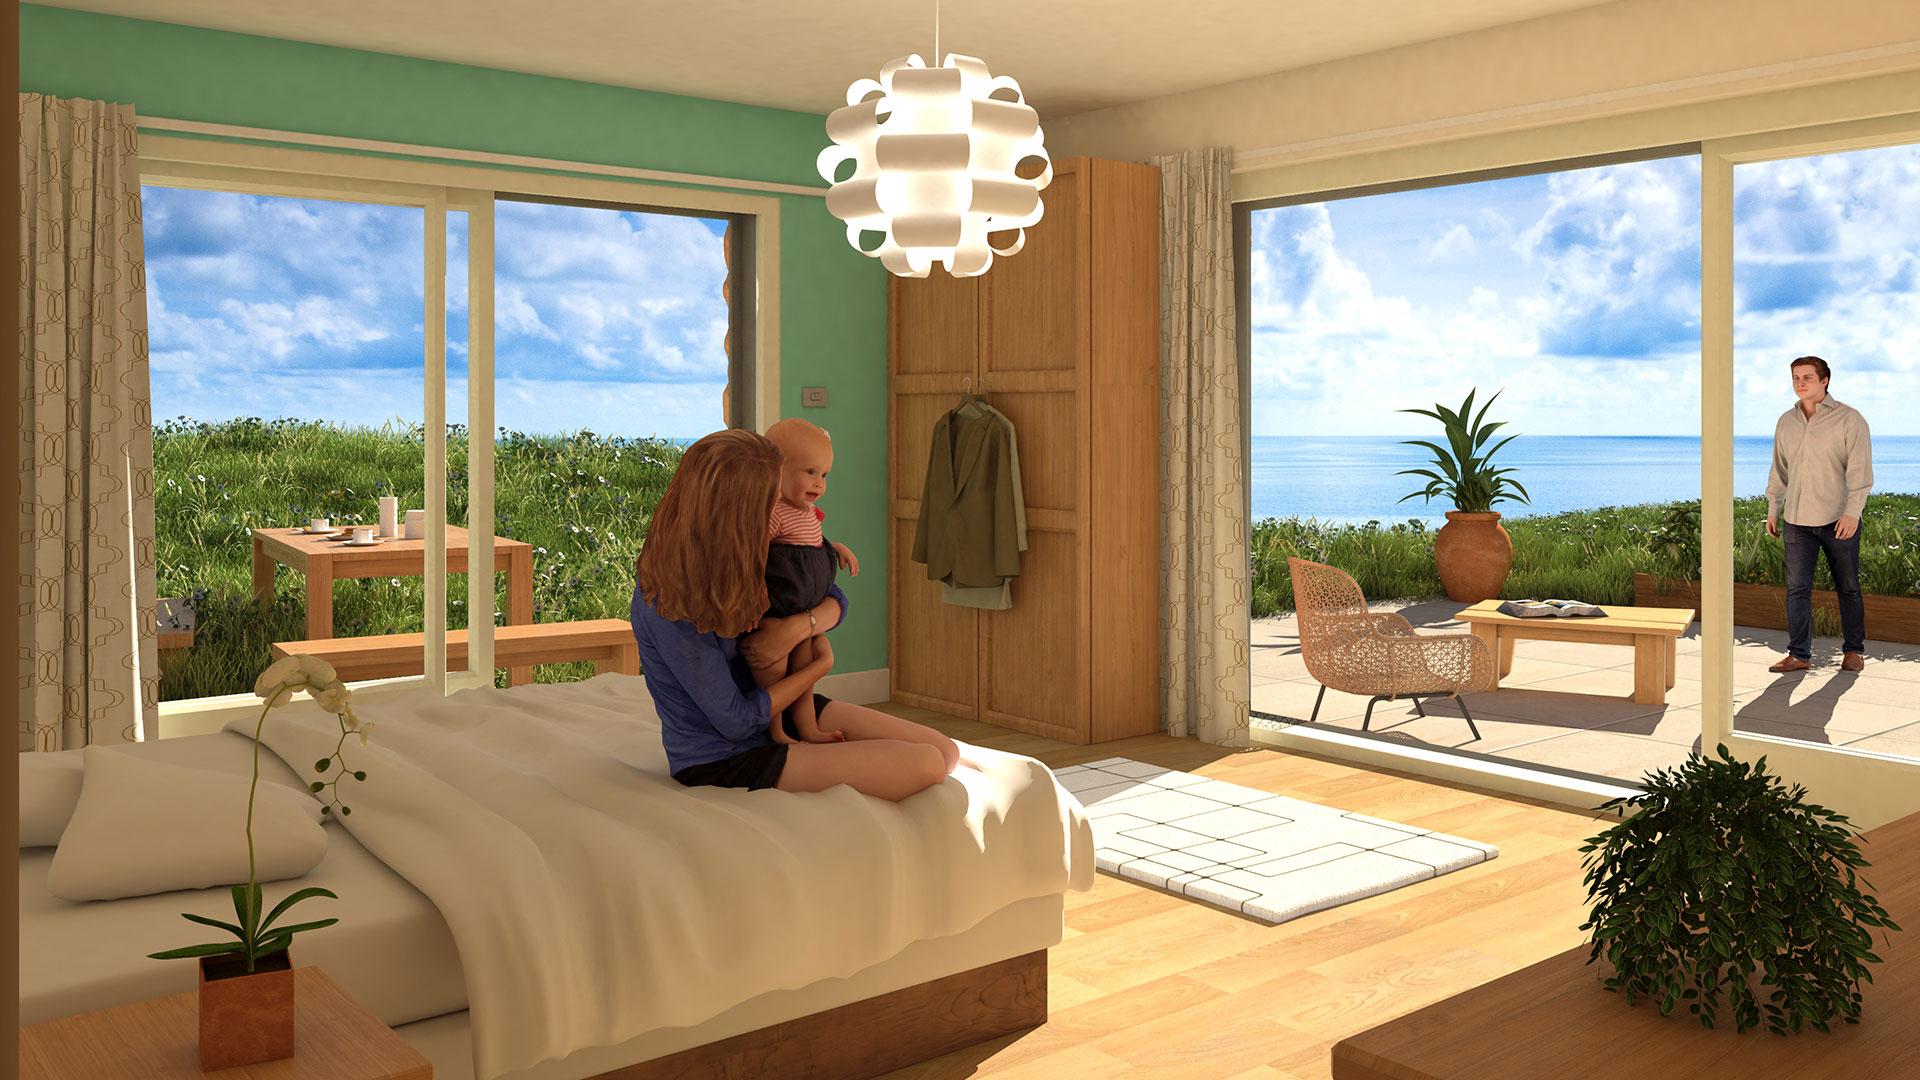 Architectural CGI visualisation image